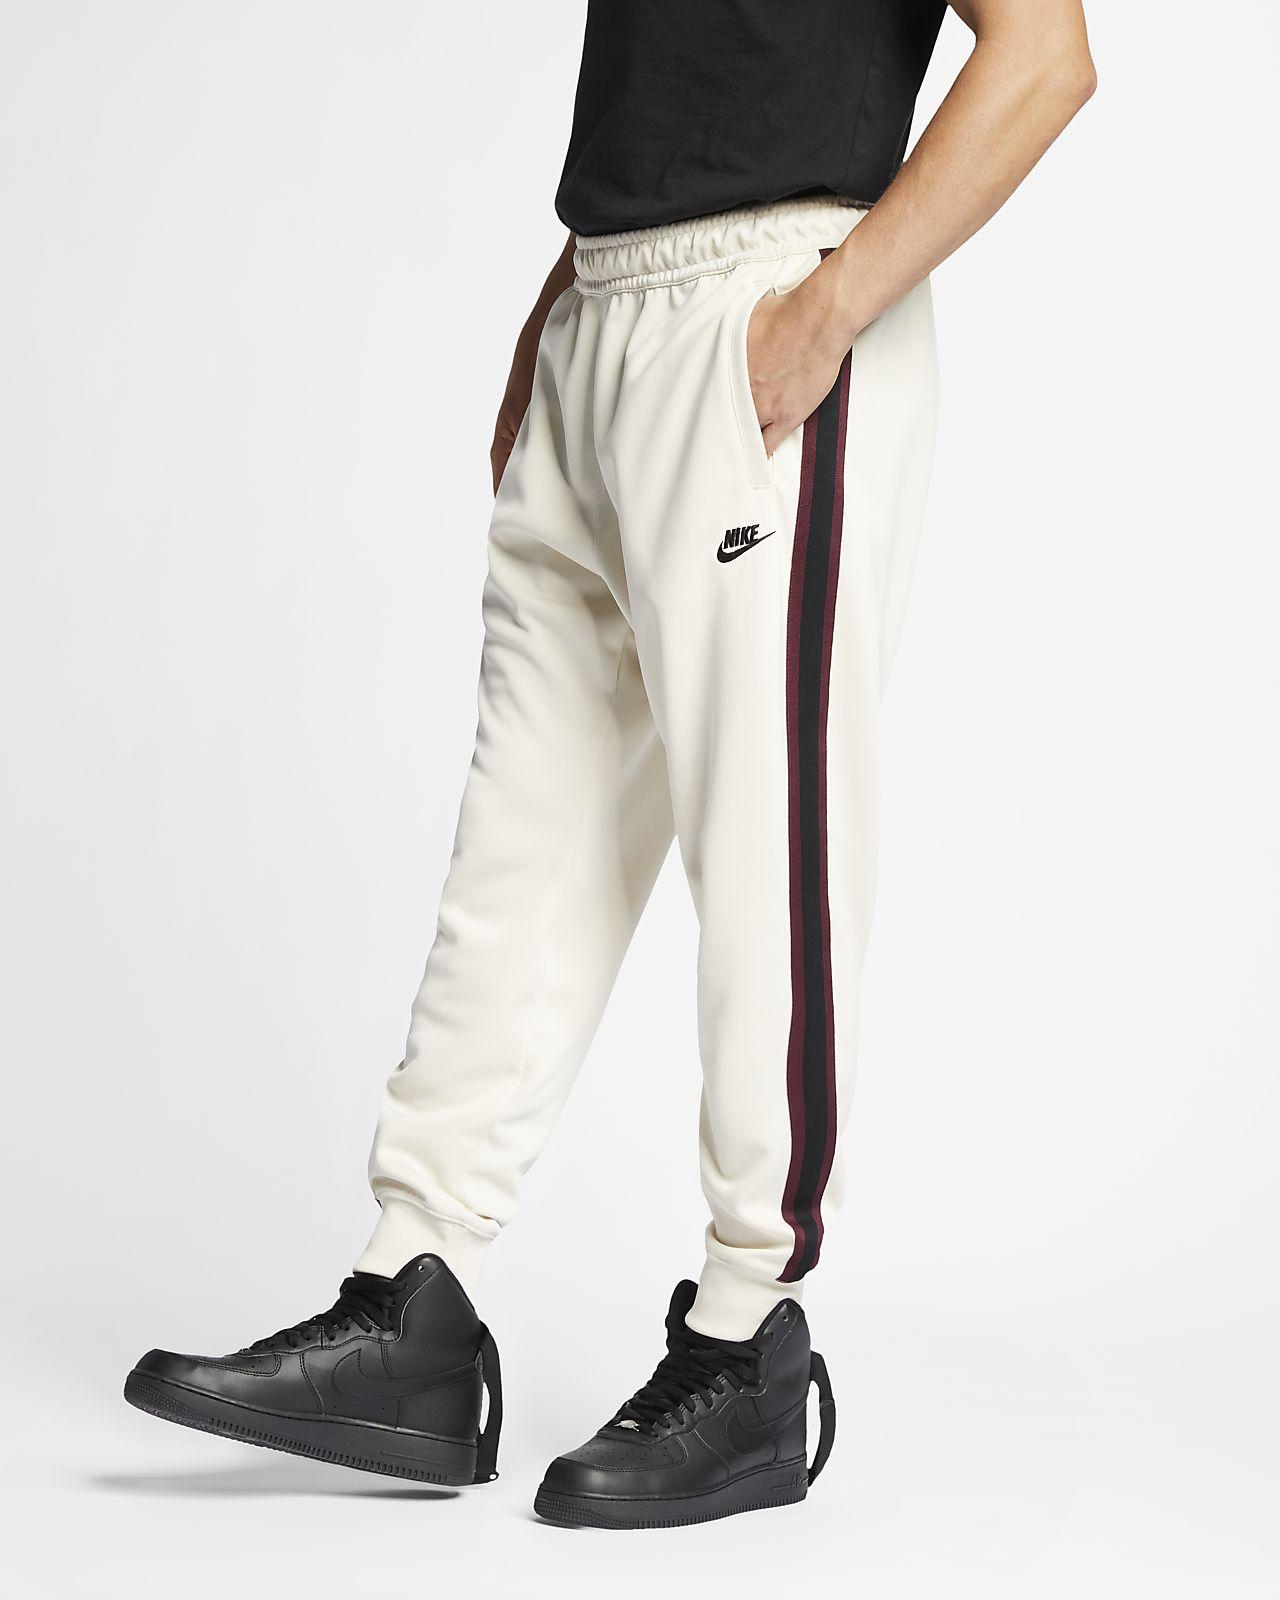 9f66db19 Nike Sportswear-joggebukse for herre. Nike.com NO